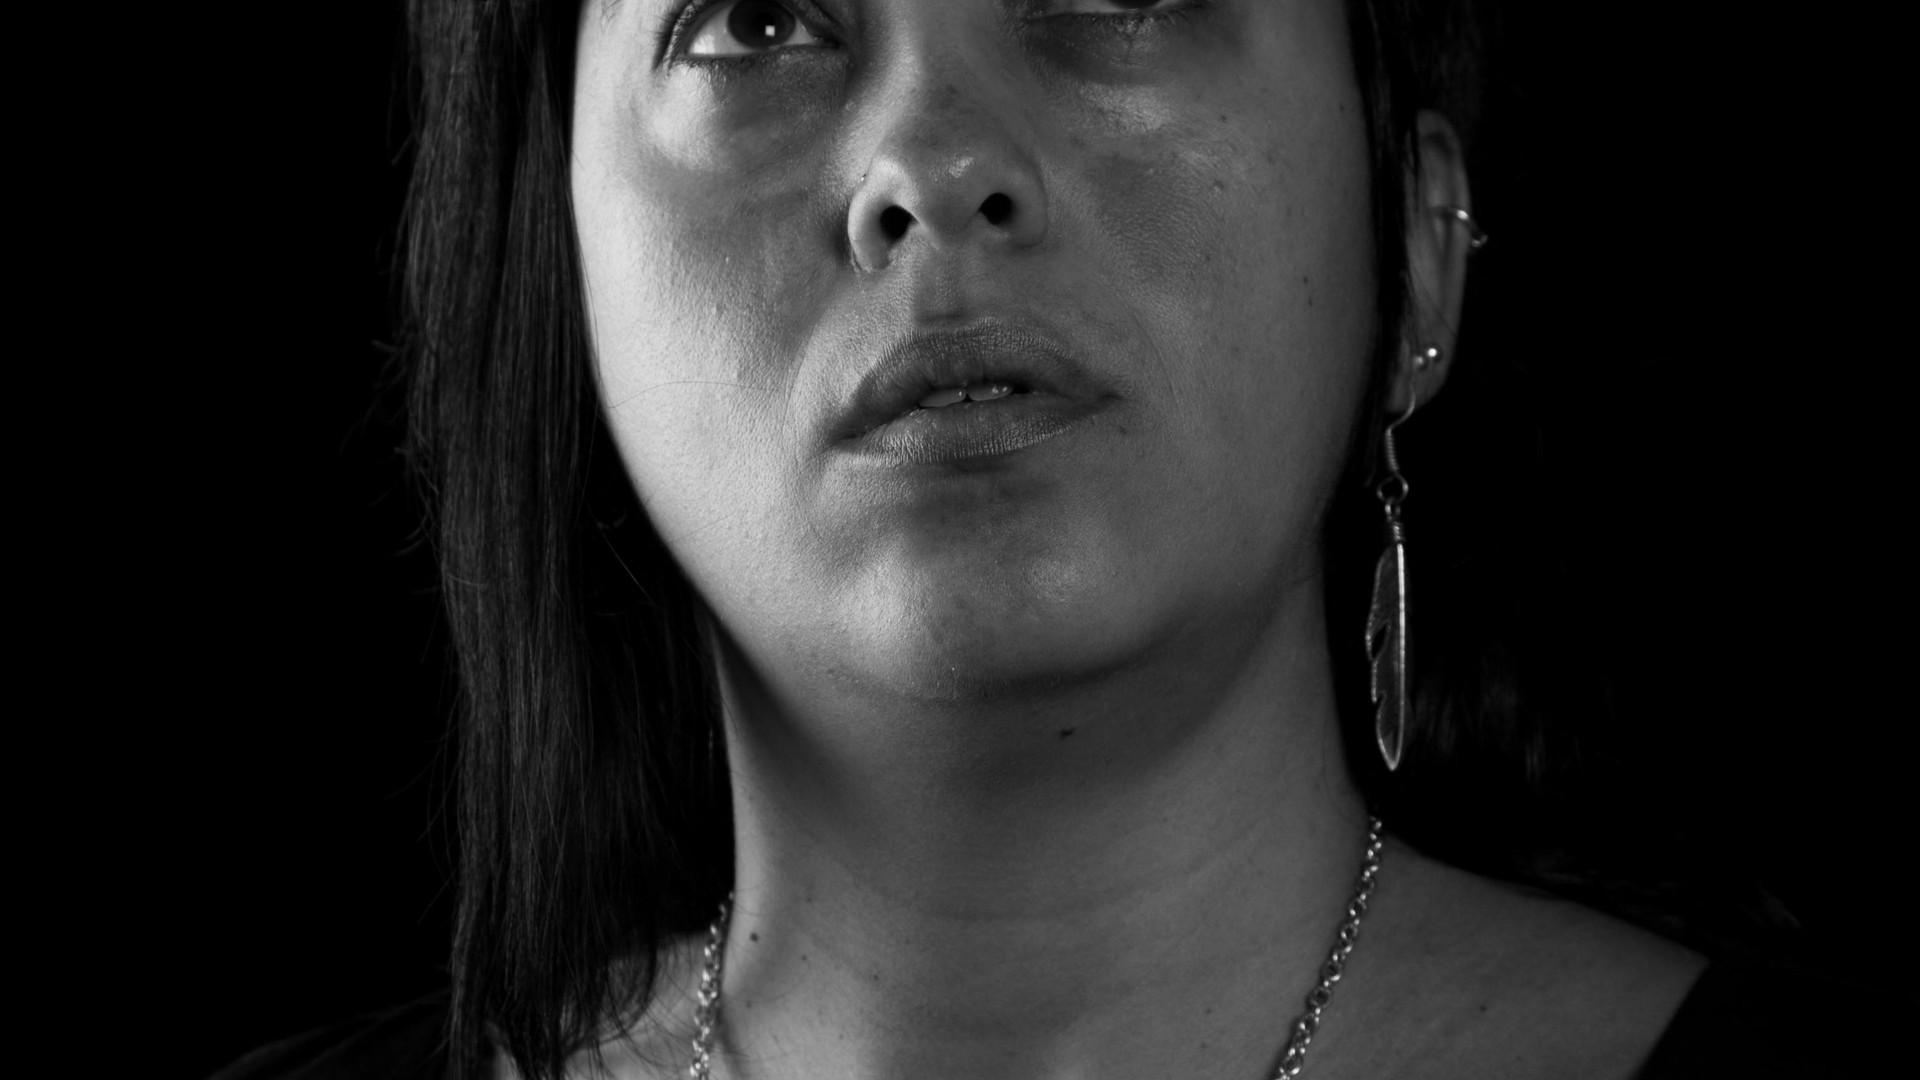 Retratos negros (Sobre la vulnerabilidad #7)